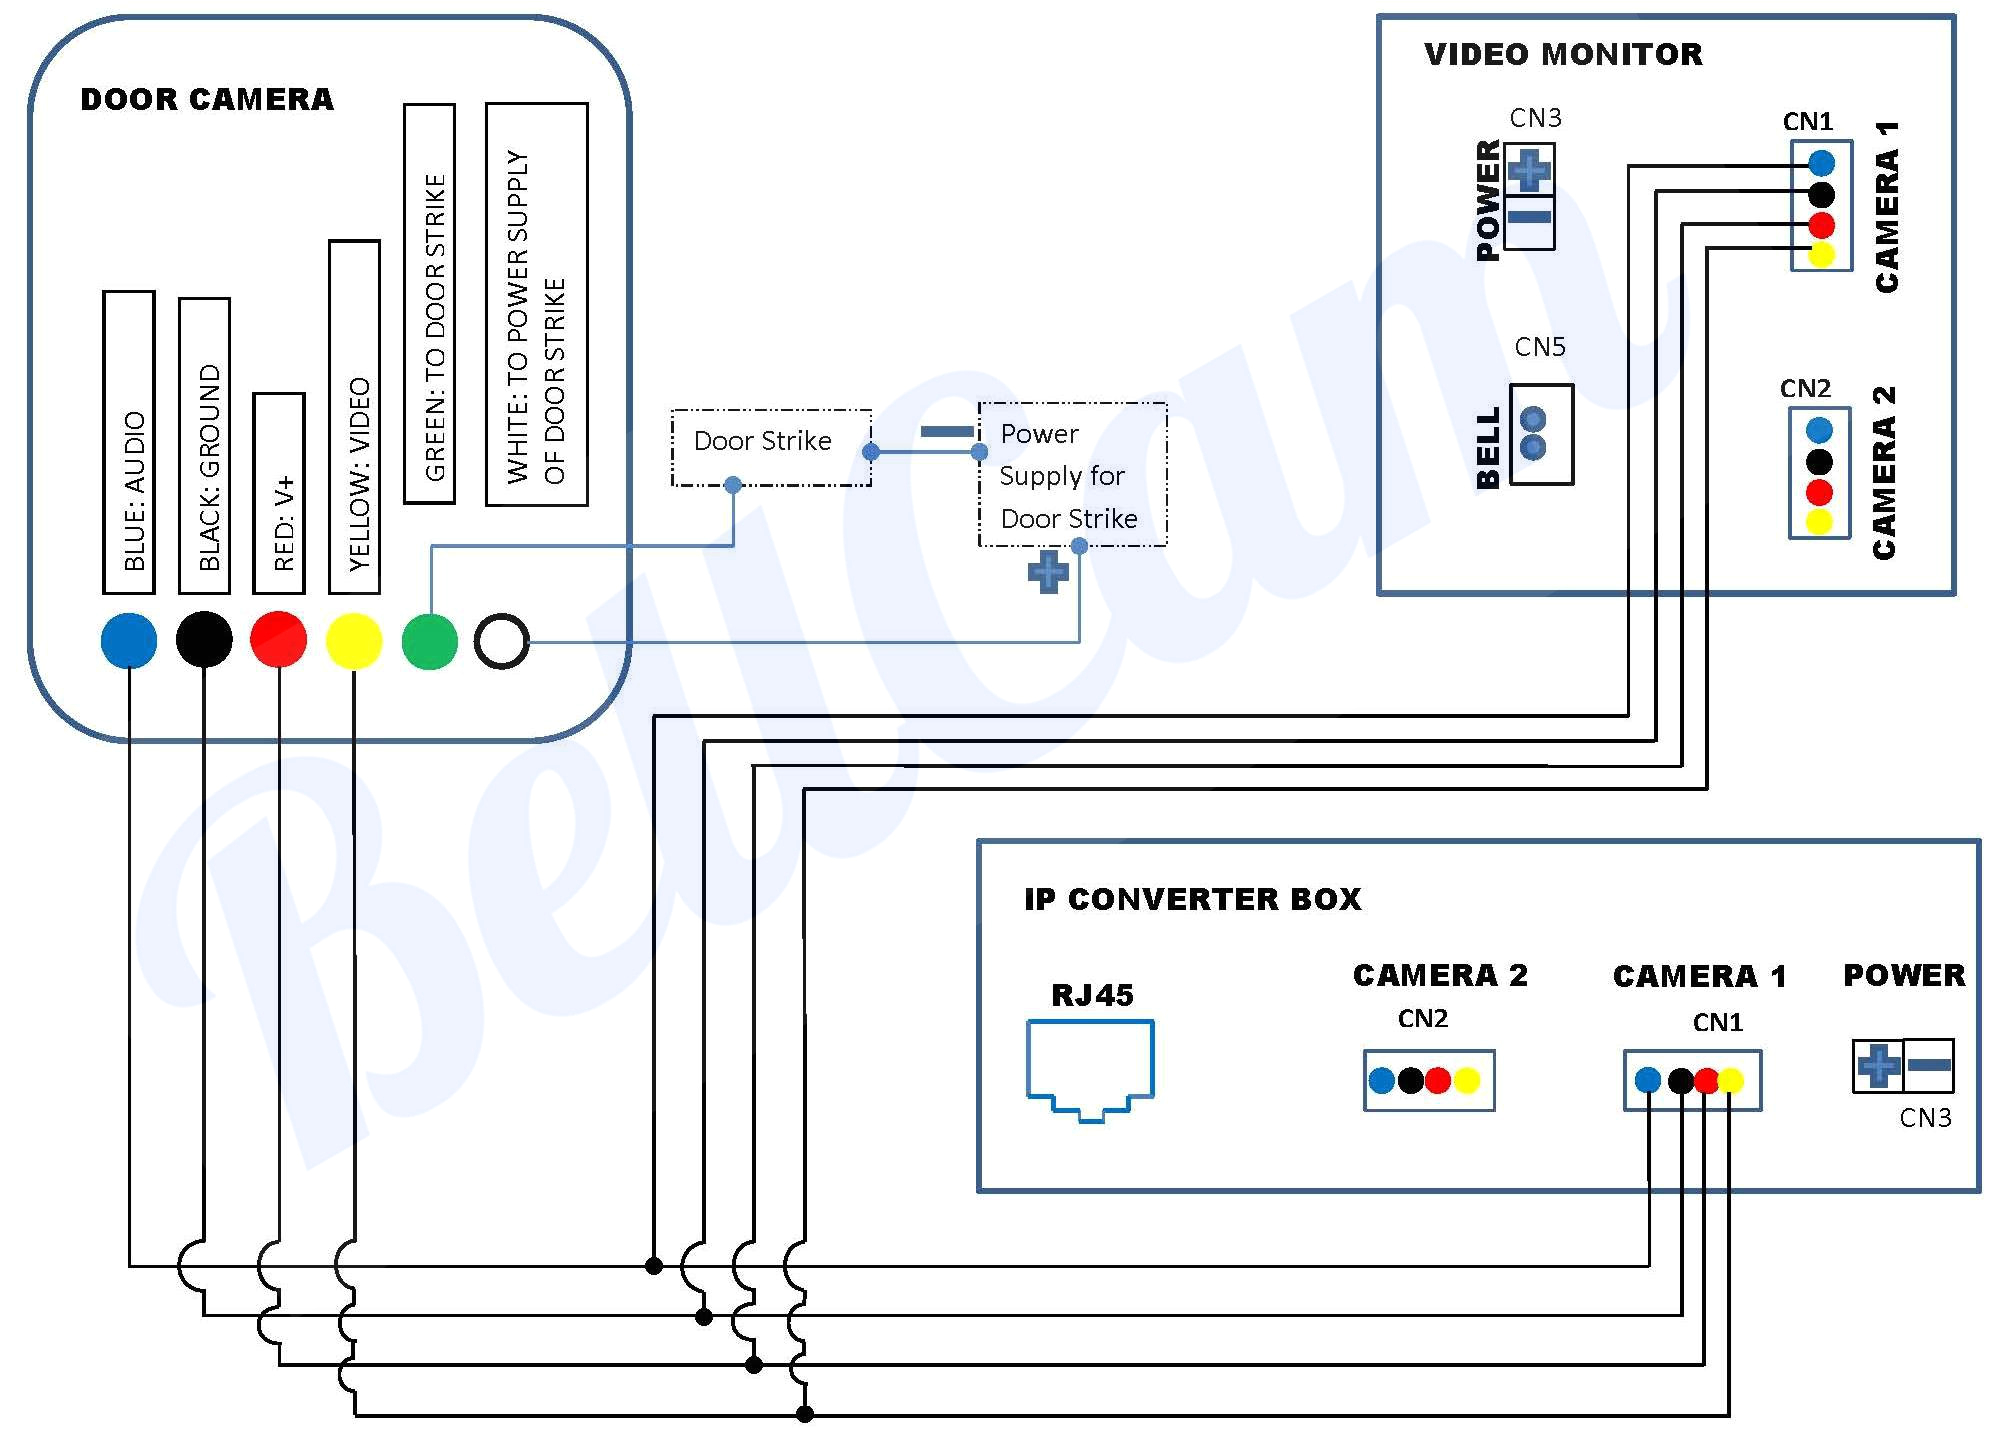 ccd camera wiring diagram wiring diagram ccd camera wiring diagram